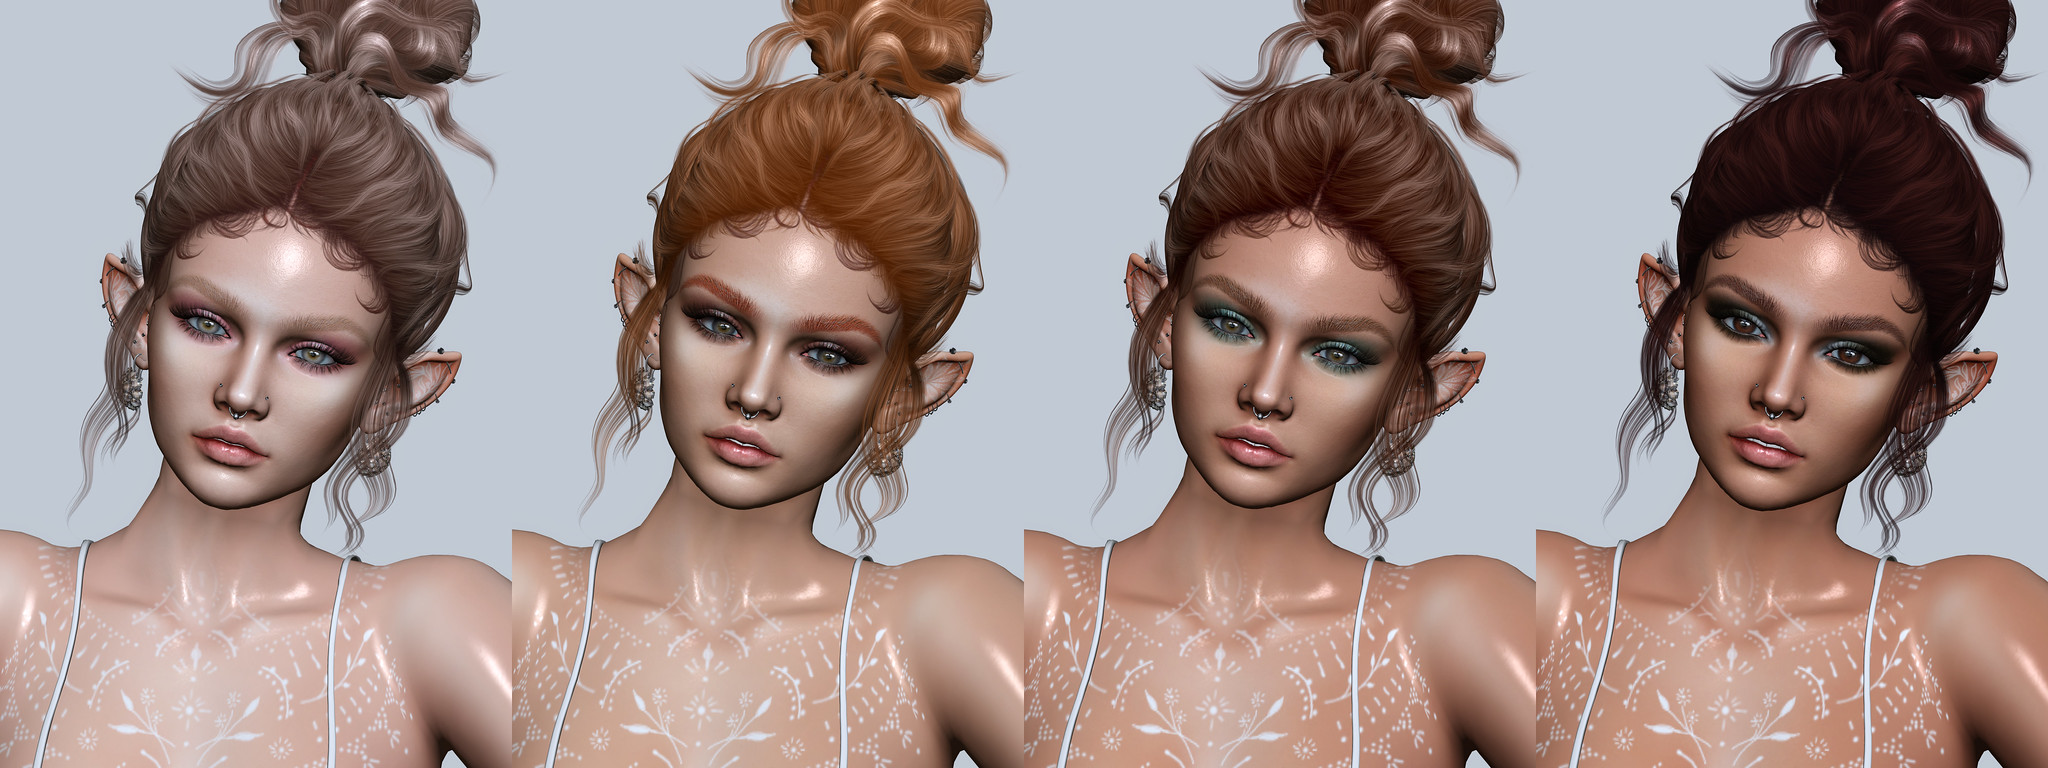 LeLUTKA EvoX Avalon 3.0 Head